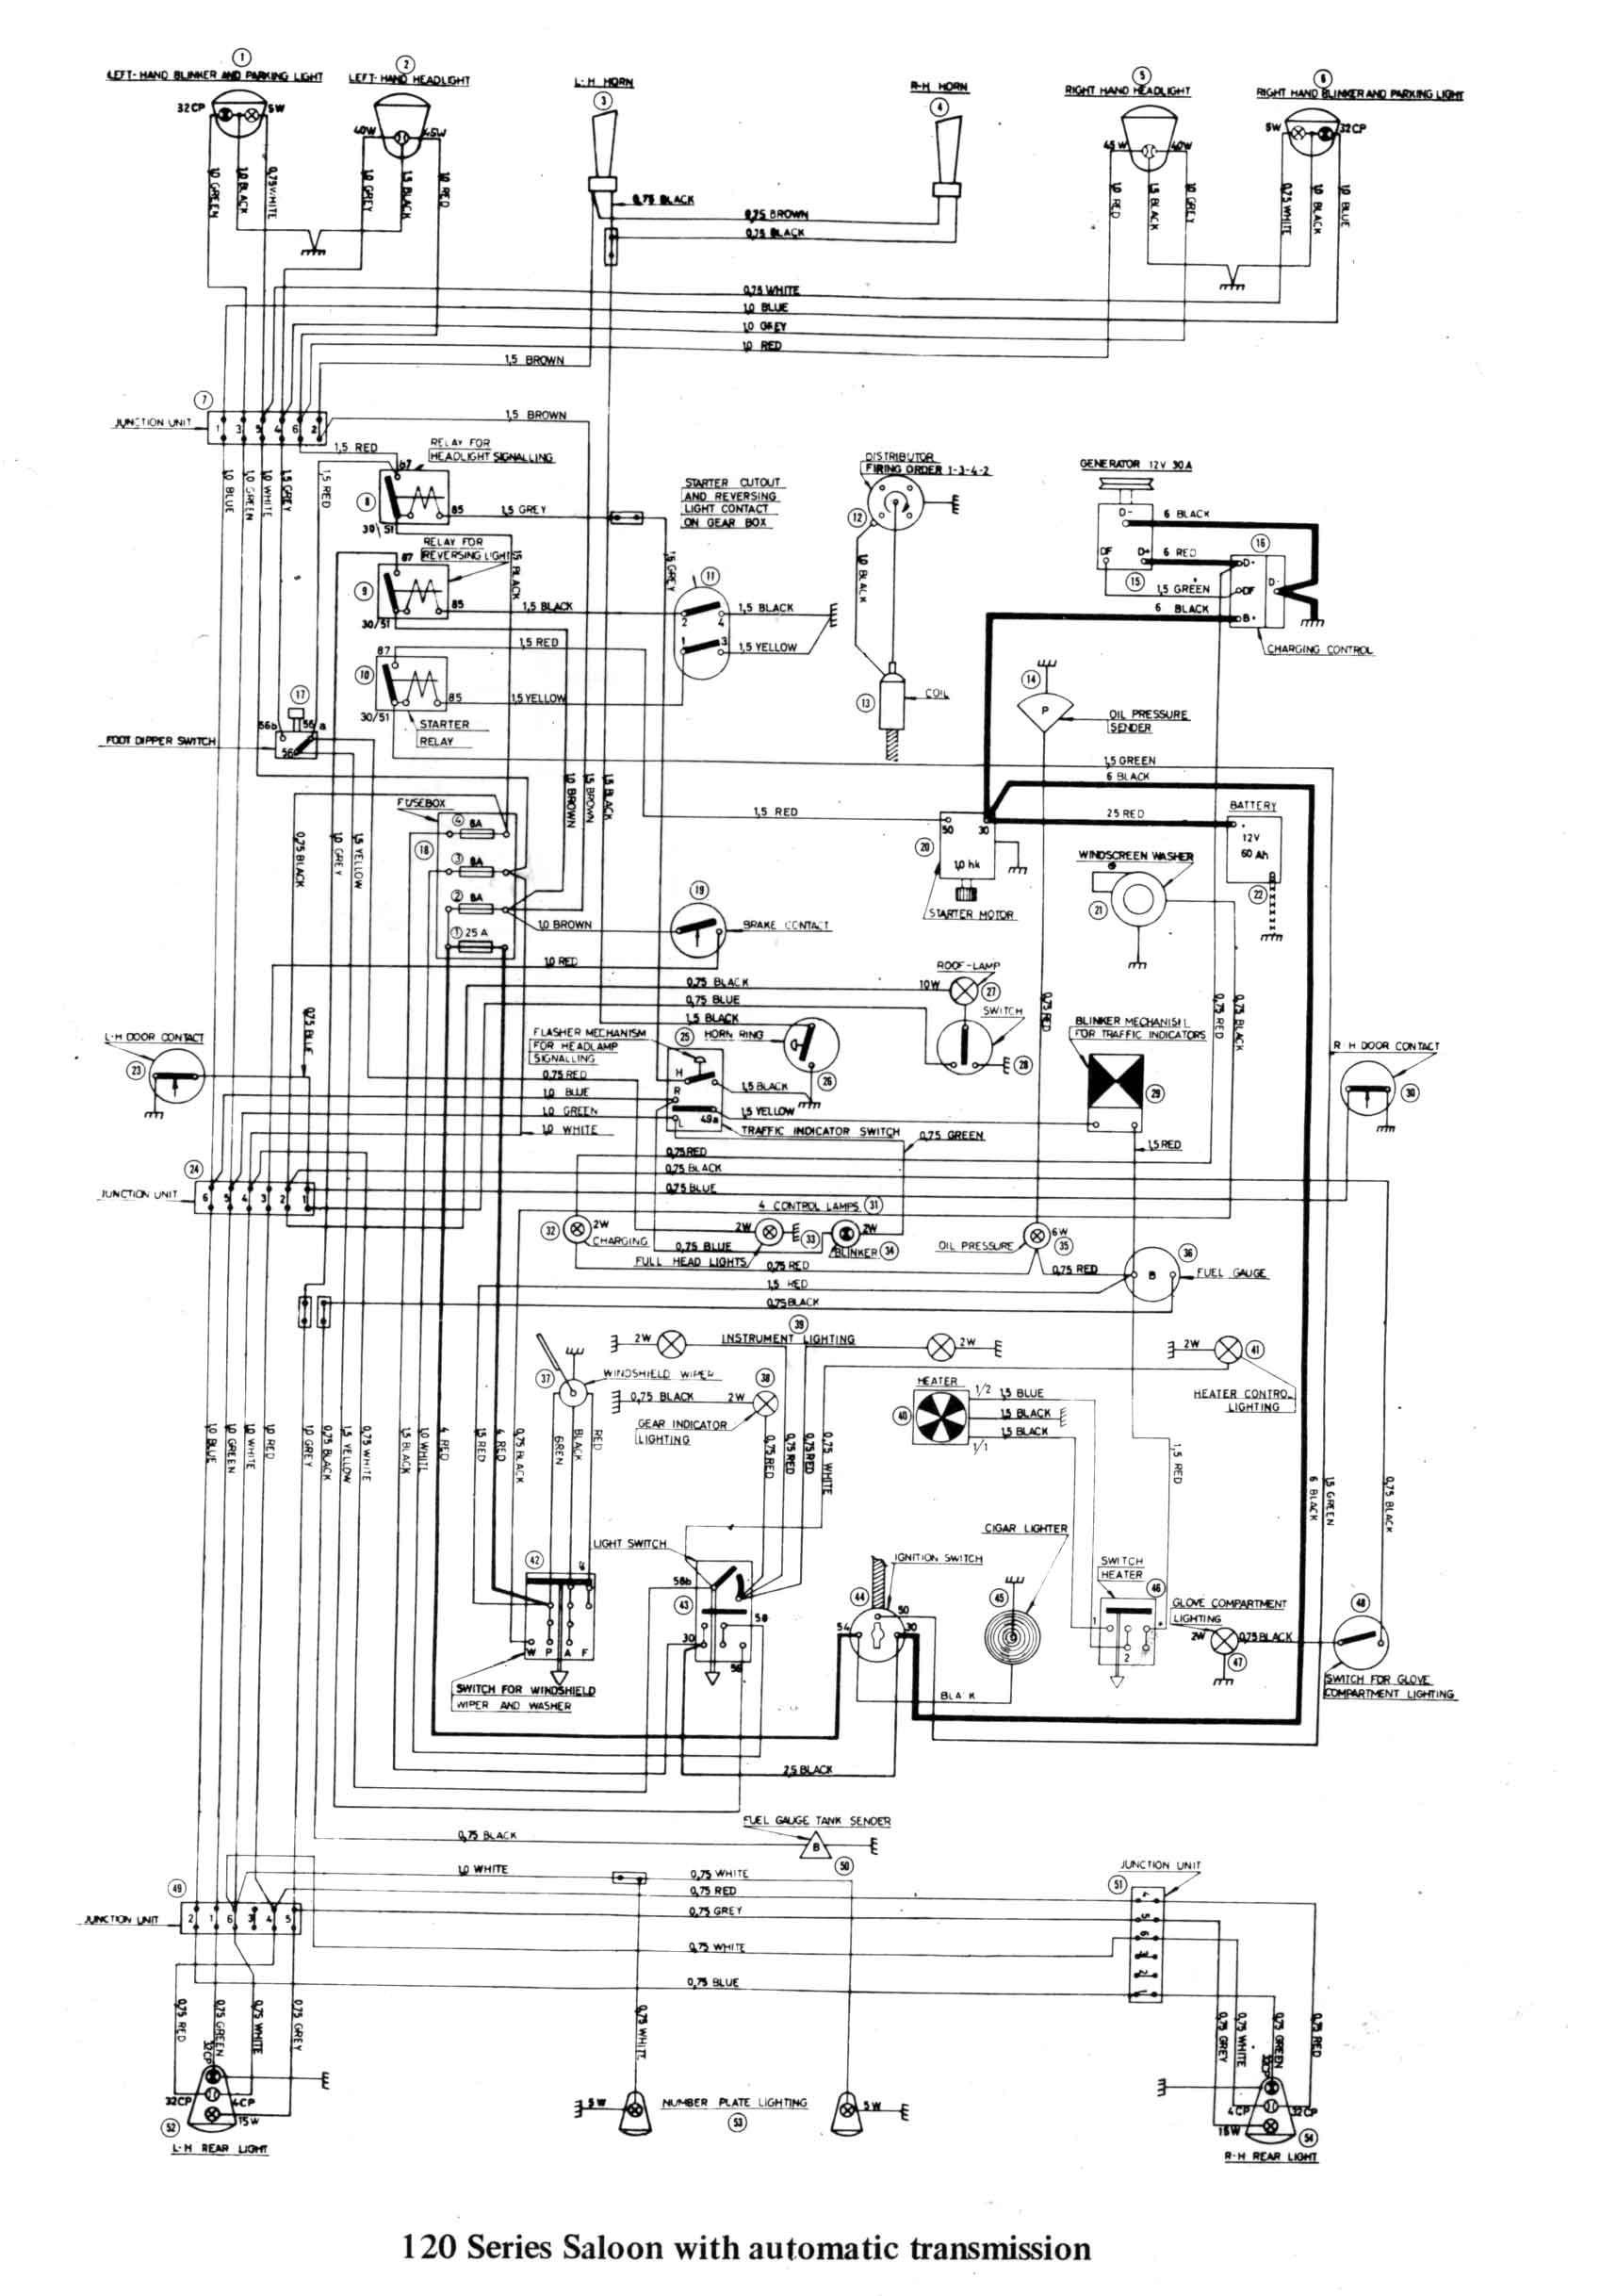 Sw Em Od Retrofitting Vintage Volvo Refer Wiring Diagram 122s Showy